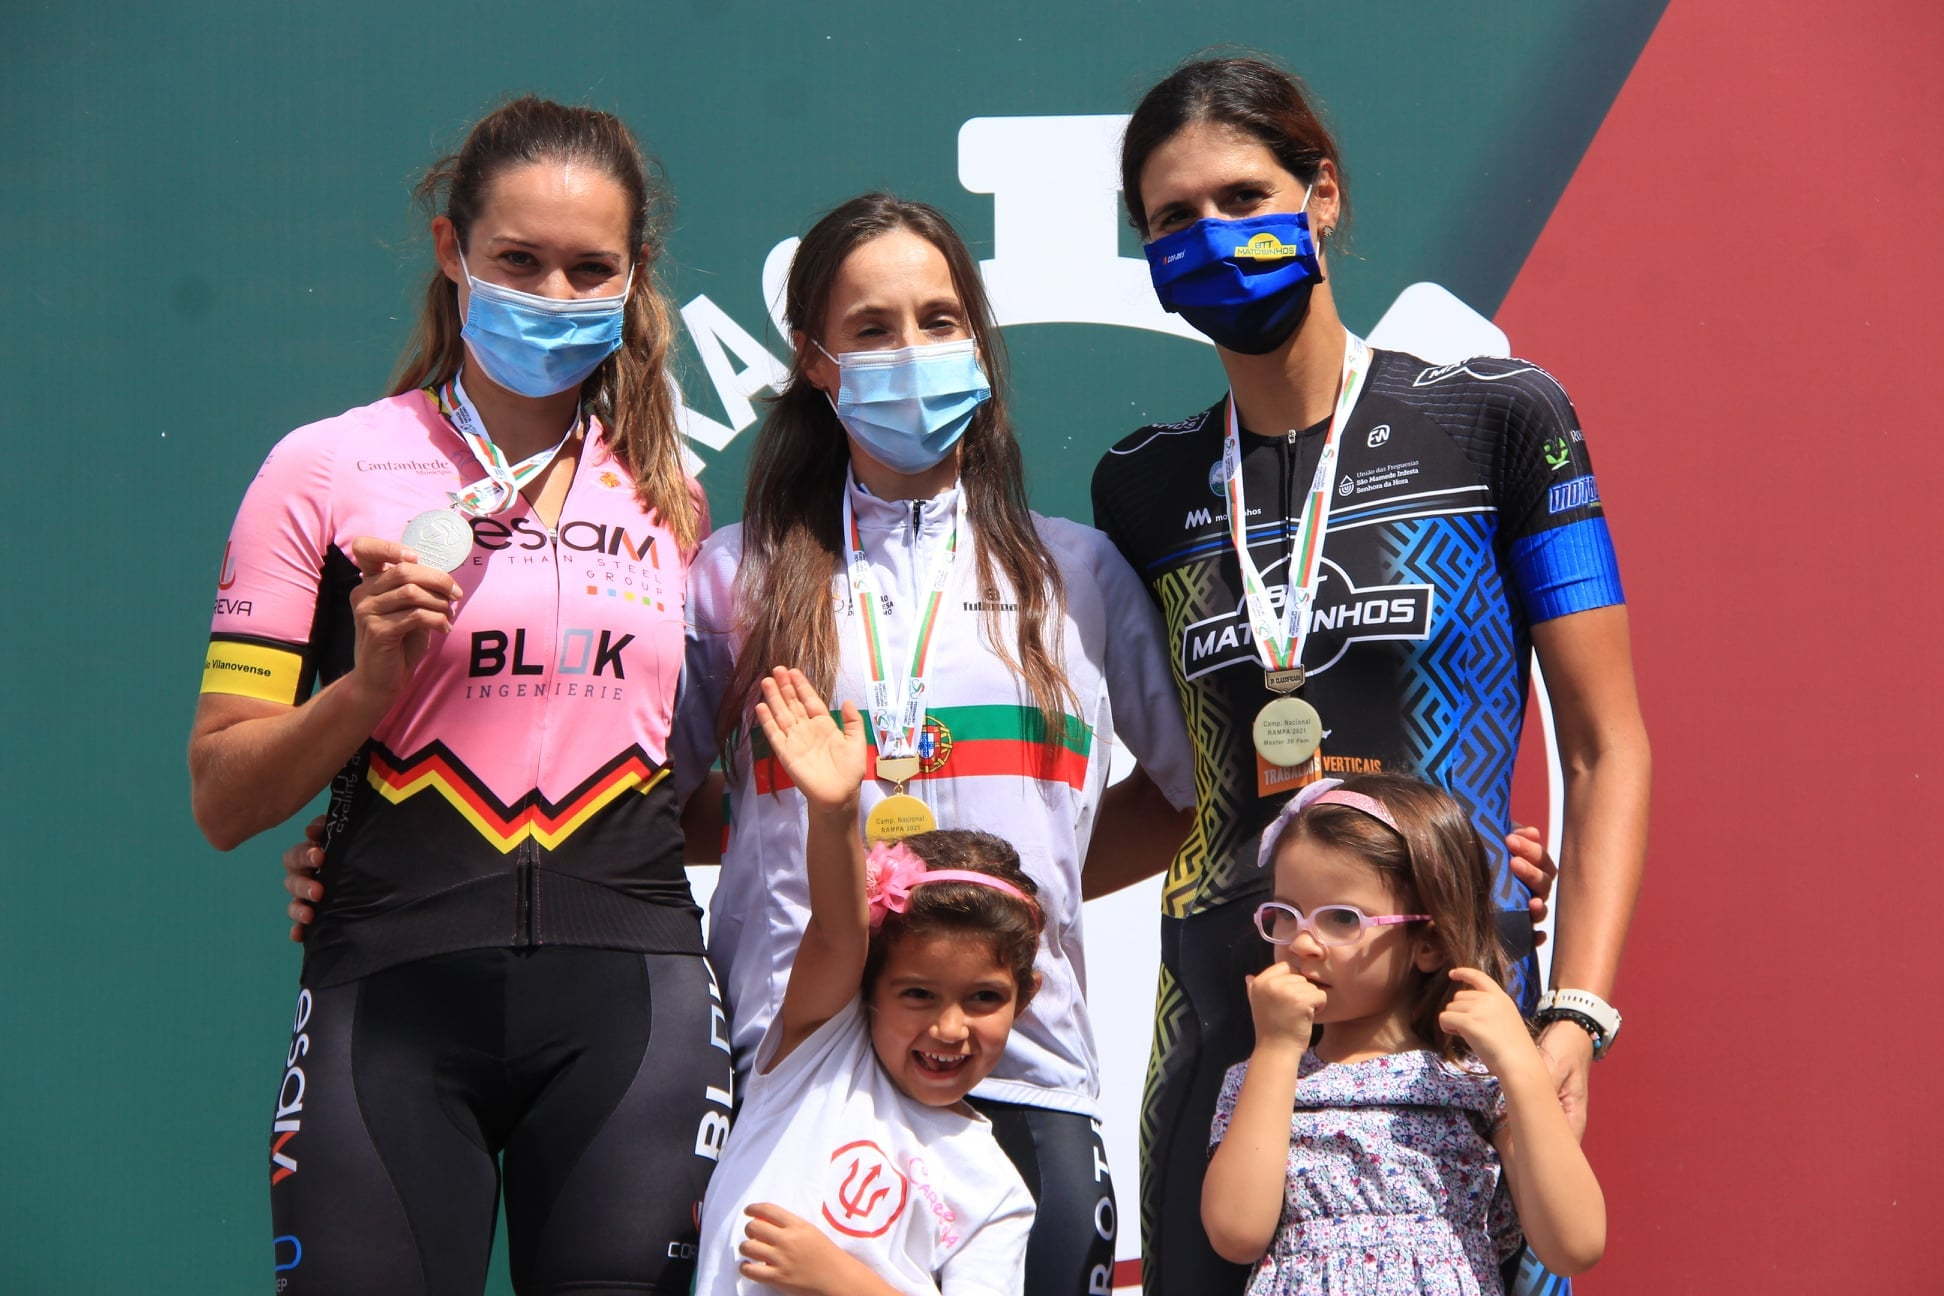 Liliana Silva 3º Lugar no Campeonato Nacional de Rampa